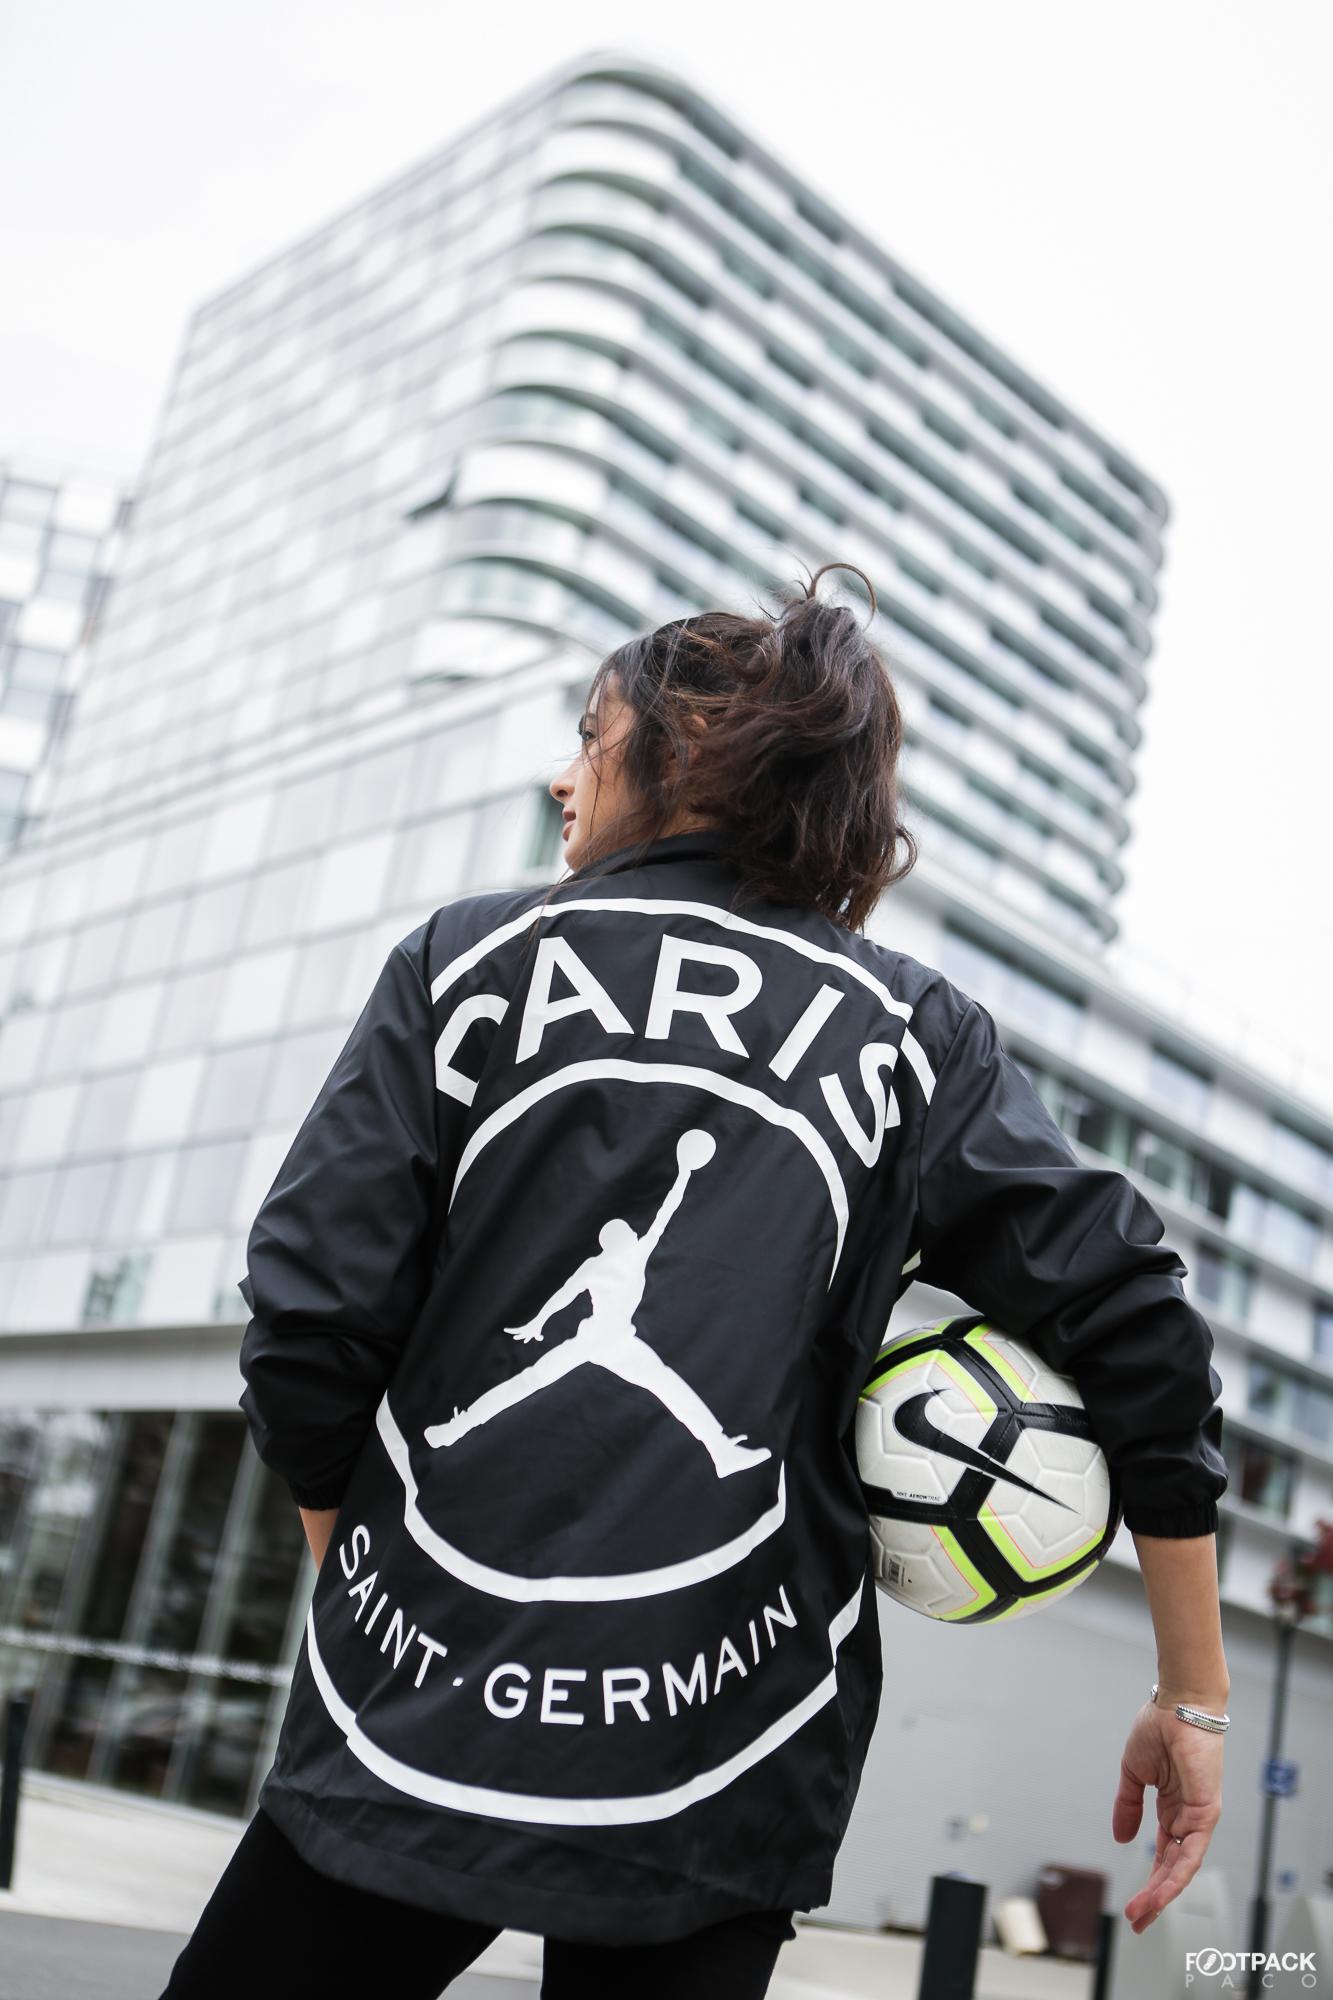 maillot-paris-saint-germain-jordan-2018-2019-footpack-2